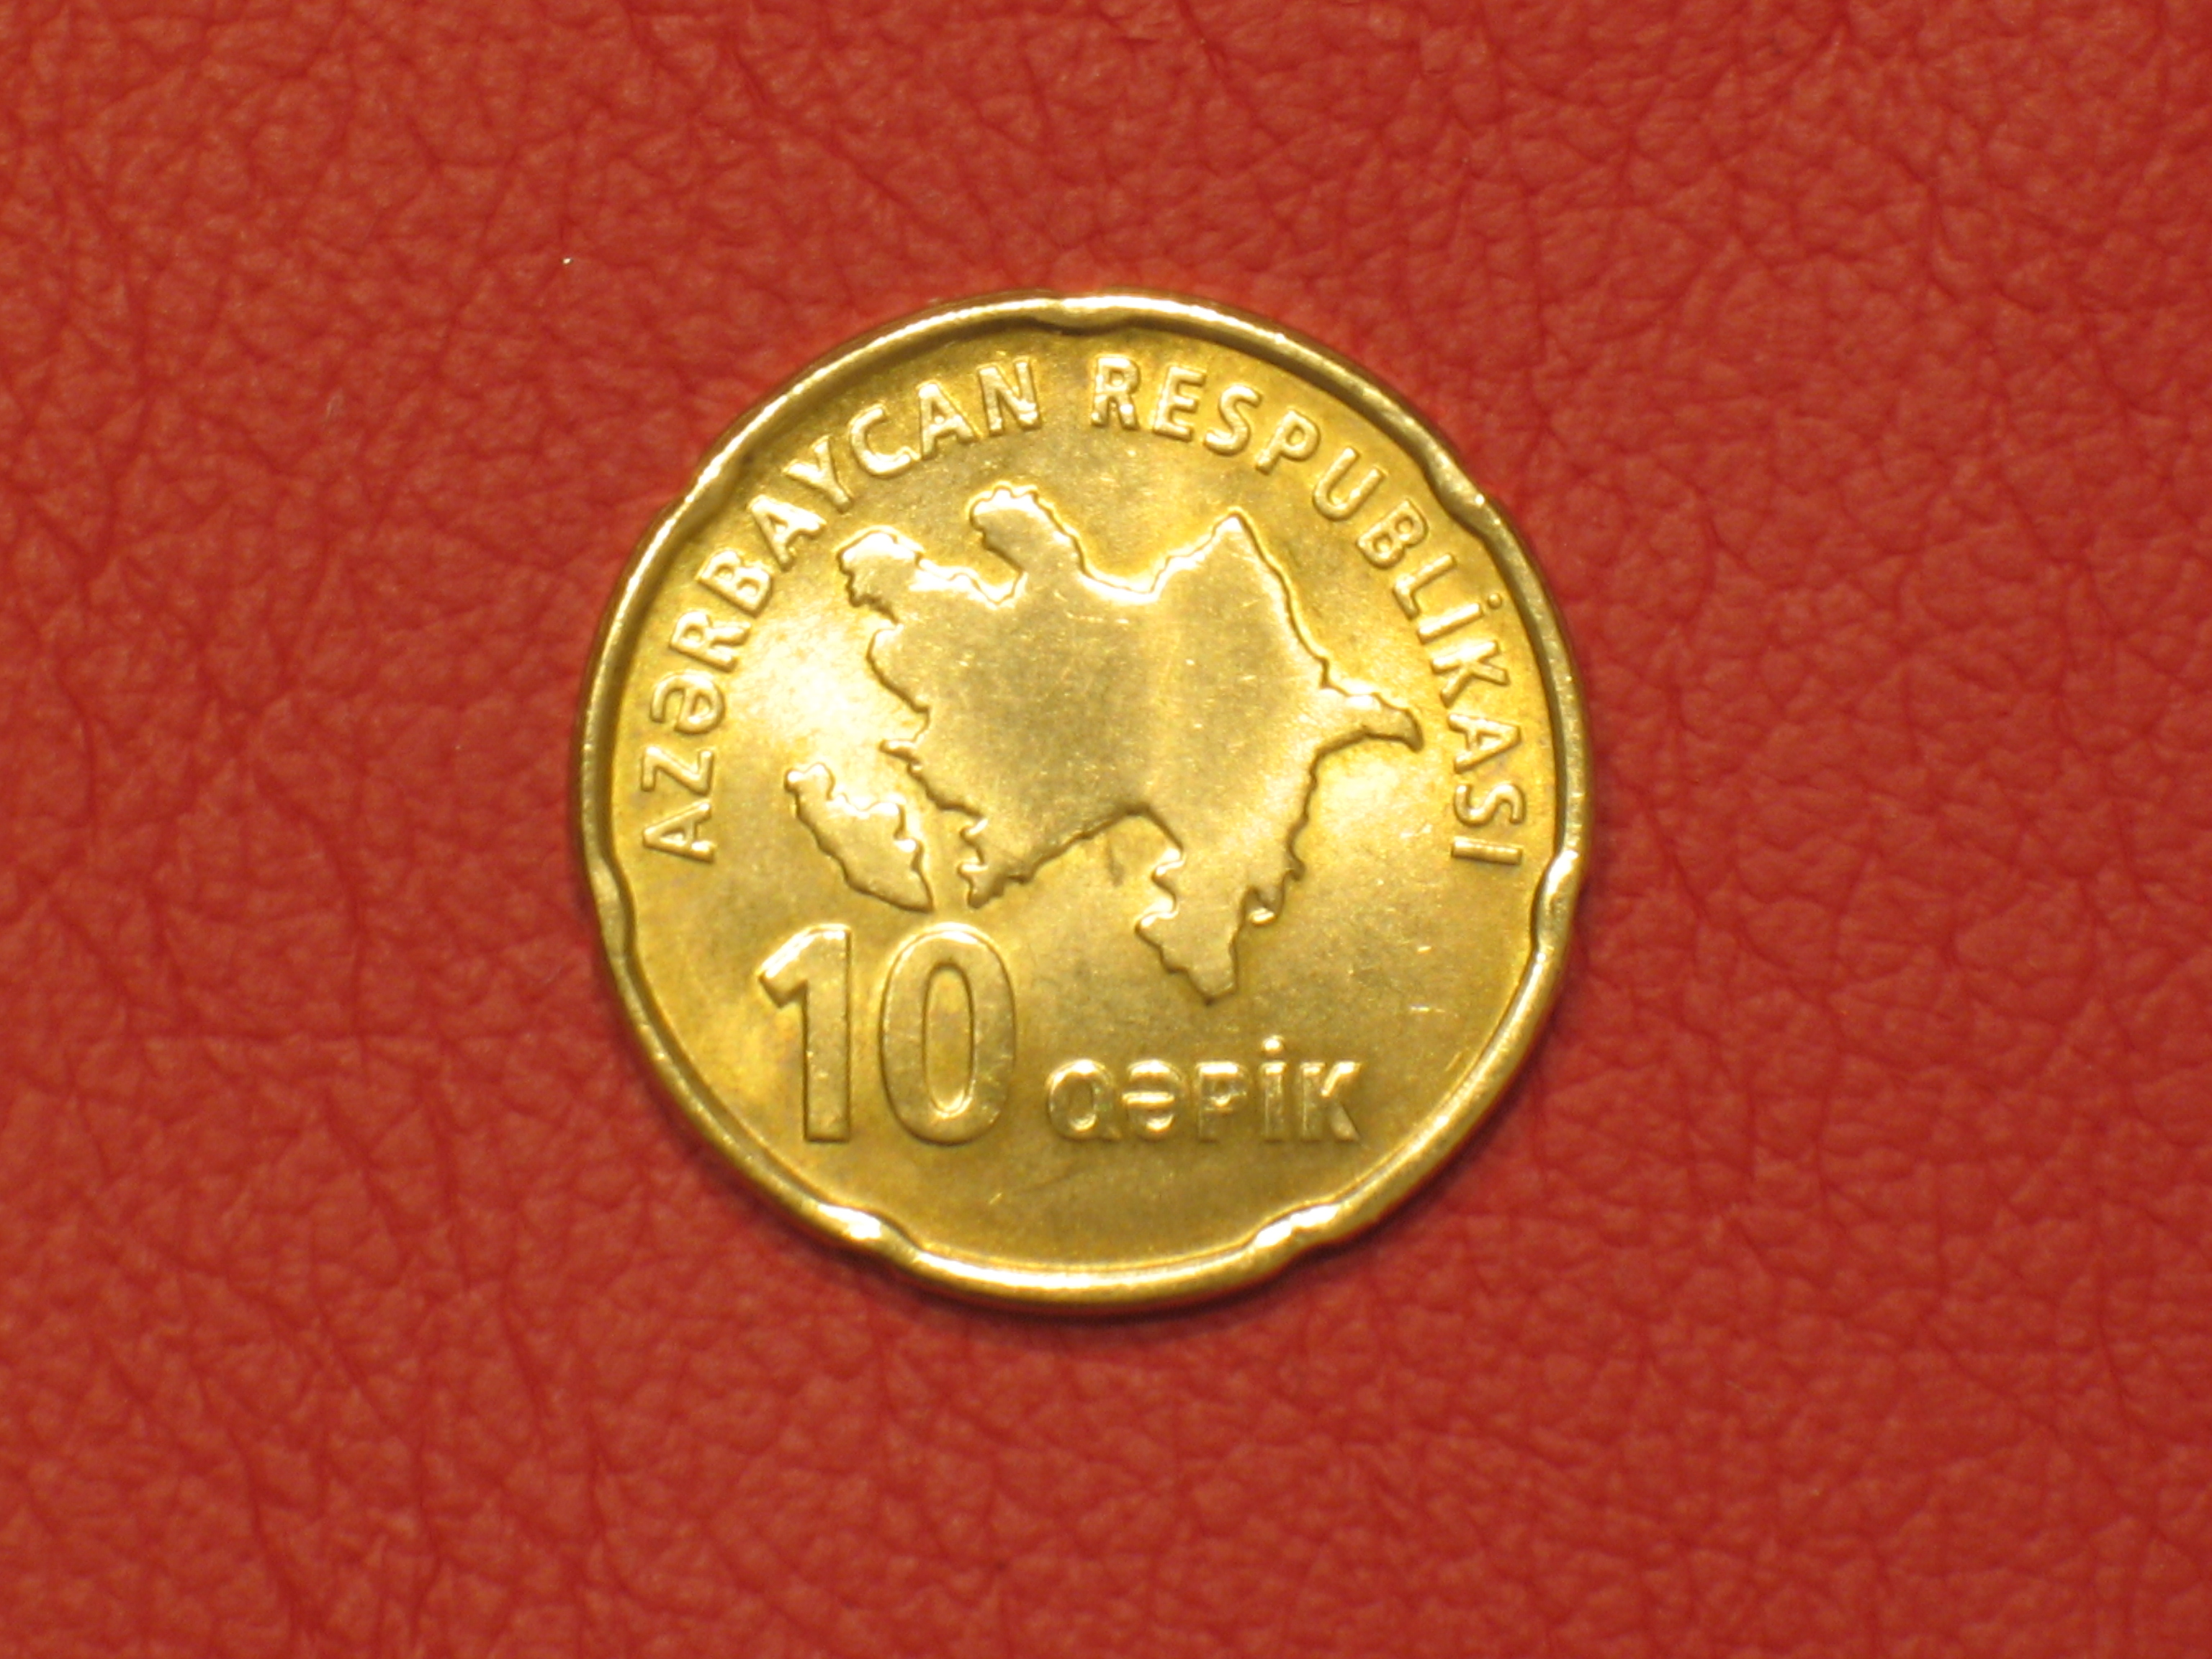 10 qepik 5 коп 1985 года цена